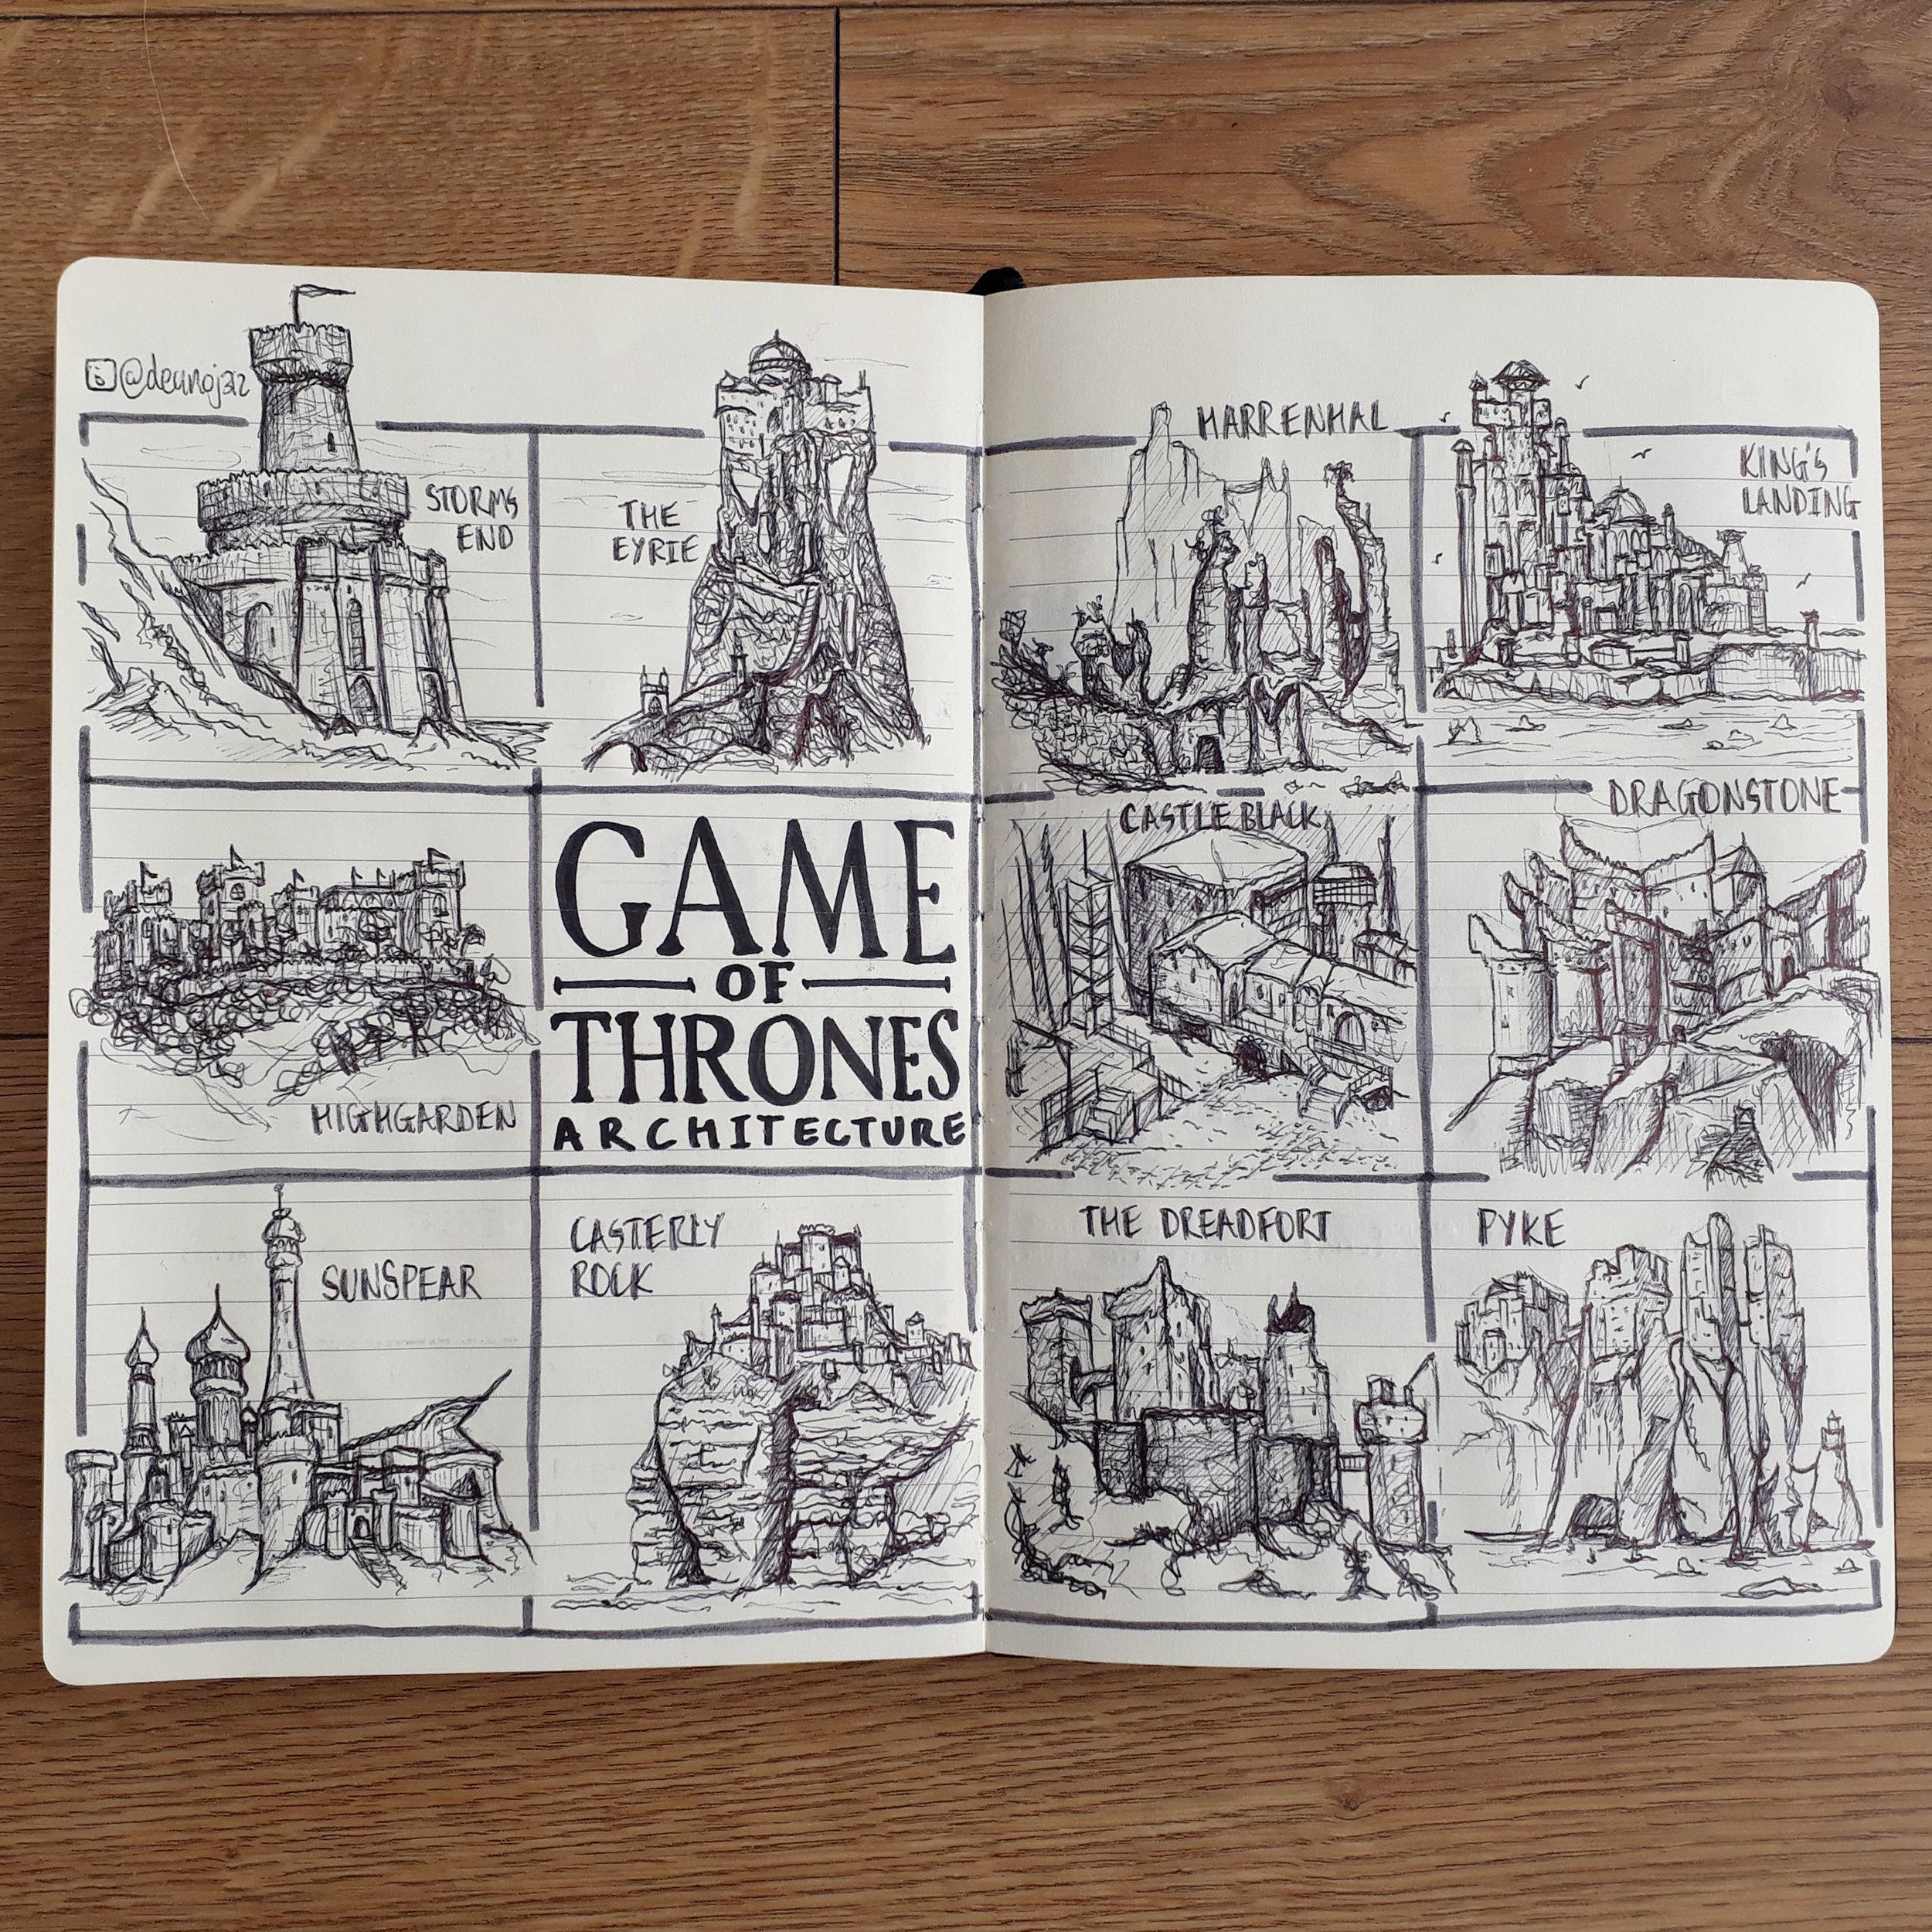 GameOfThronesArchitecture1.jpg